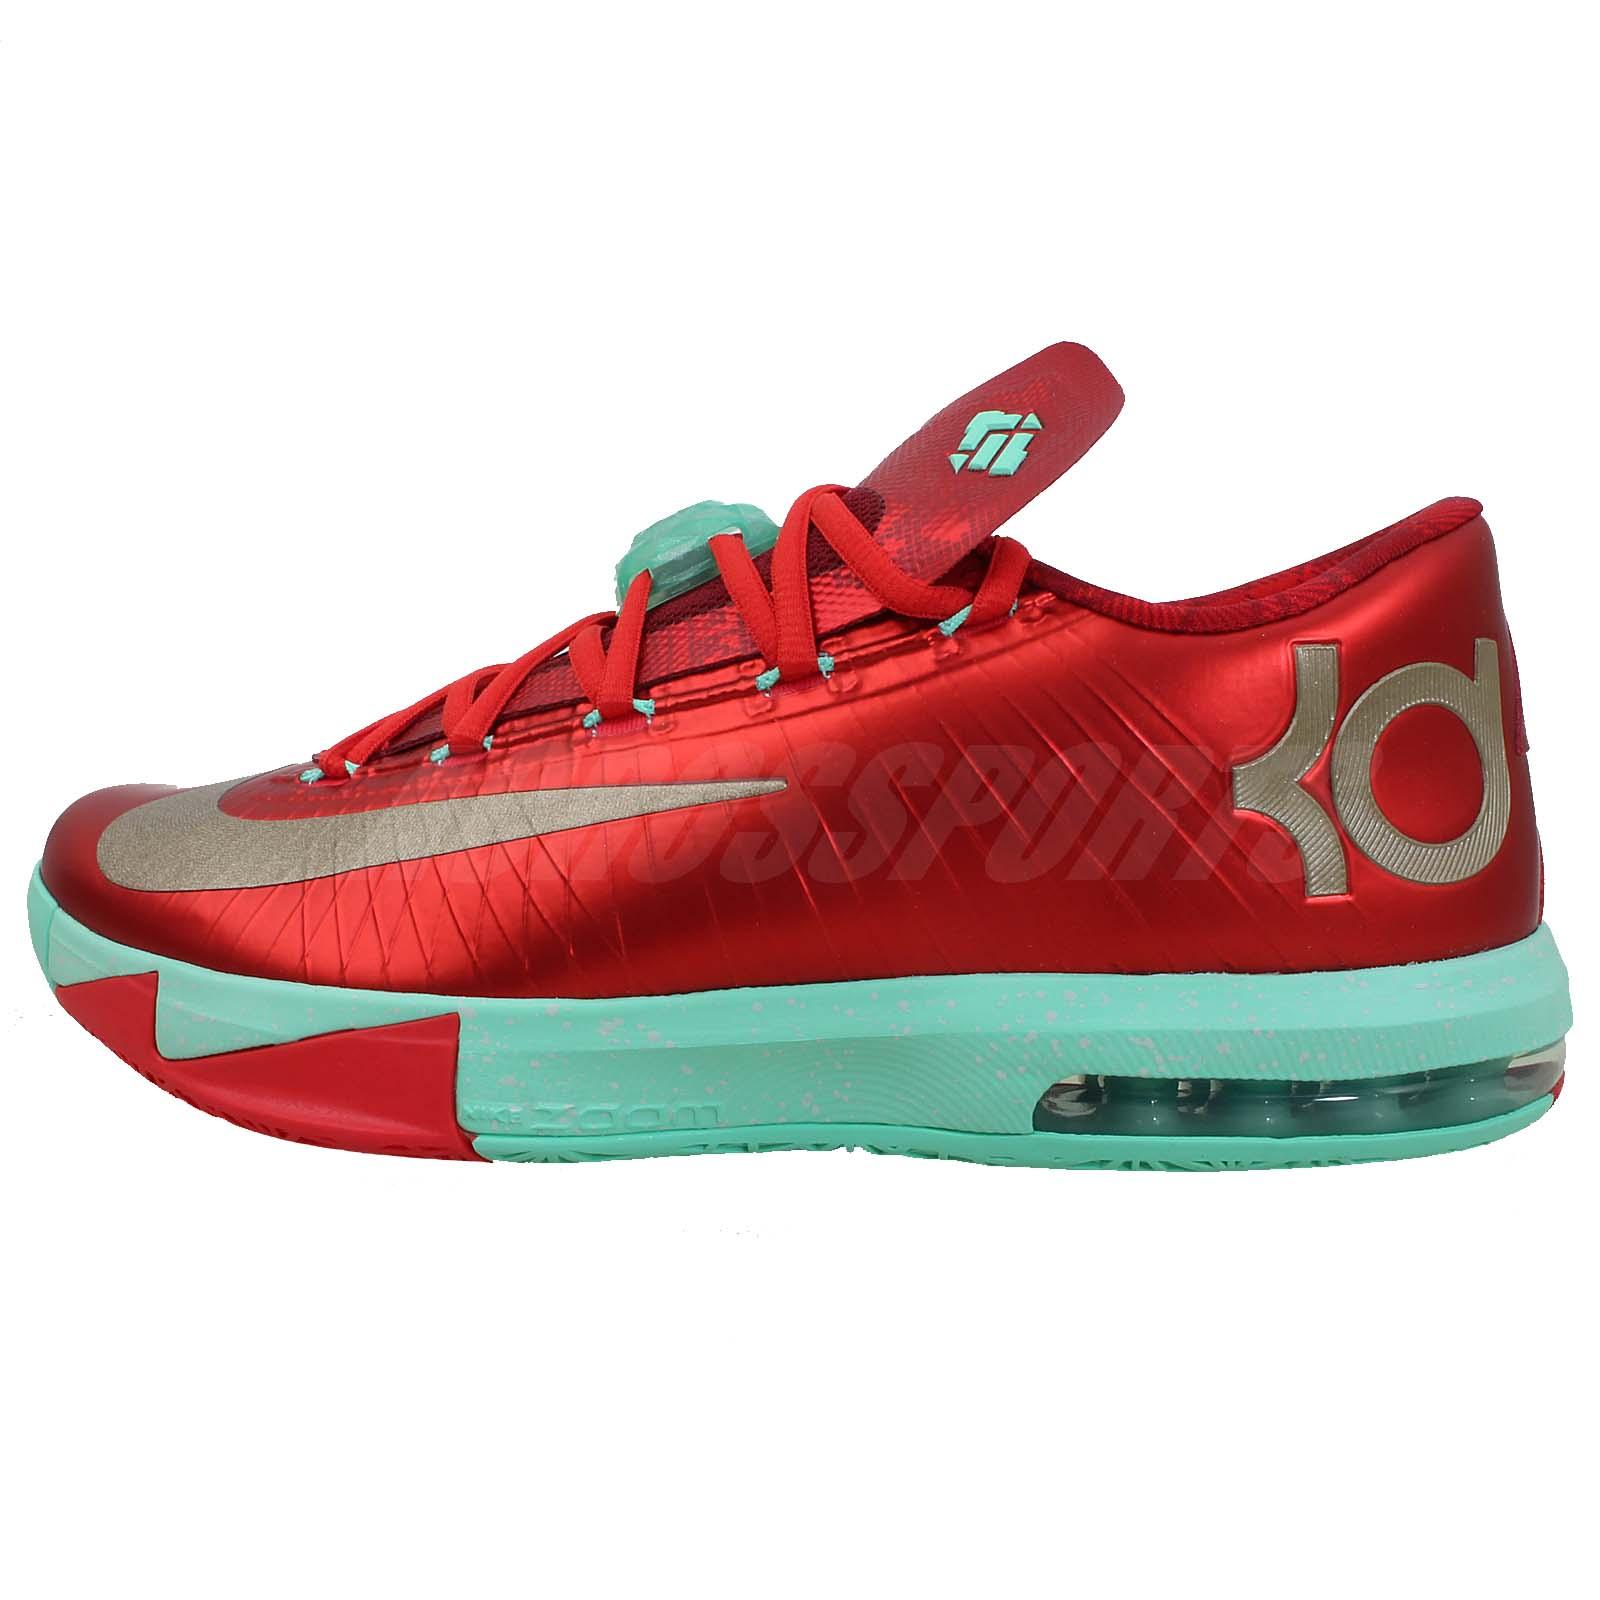 Mens Basketball Shoes Onsale For Christmas